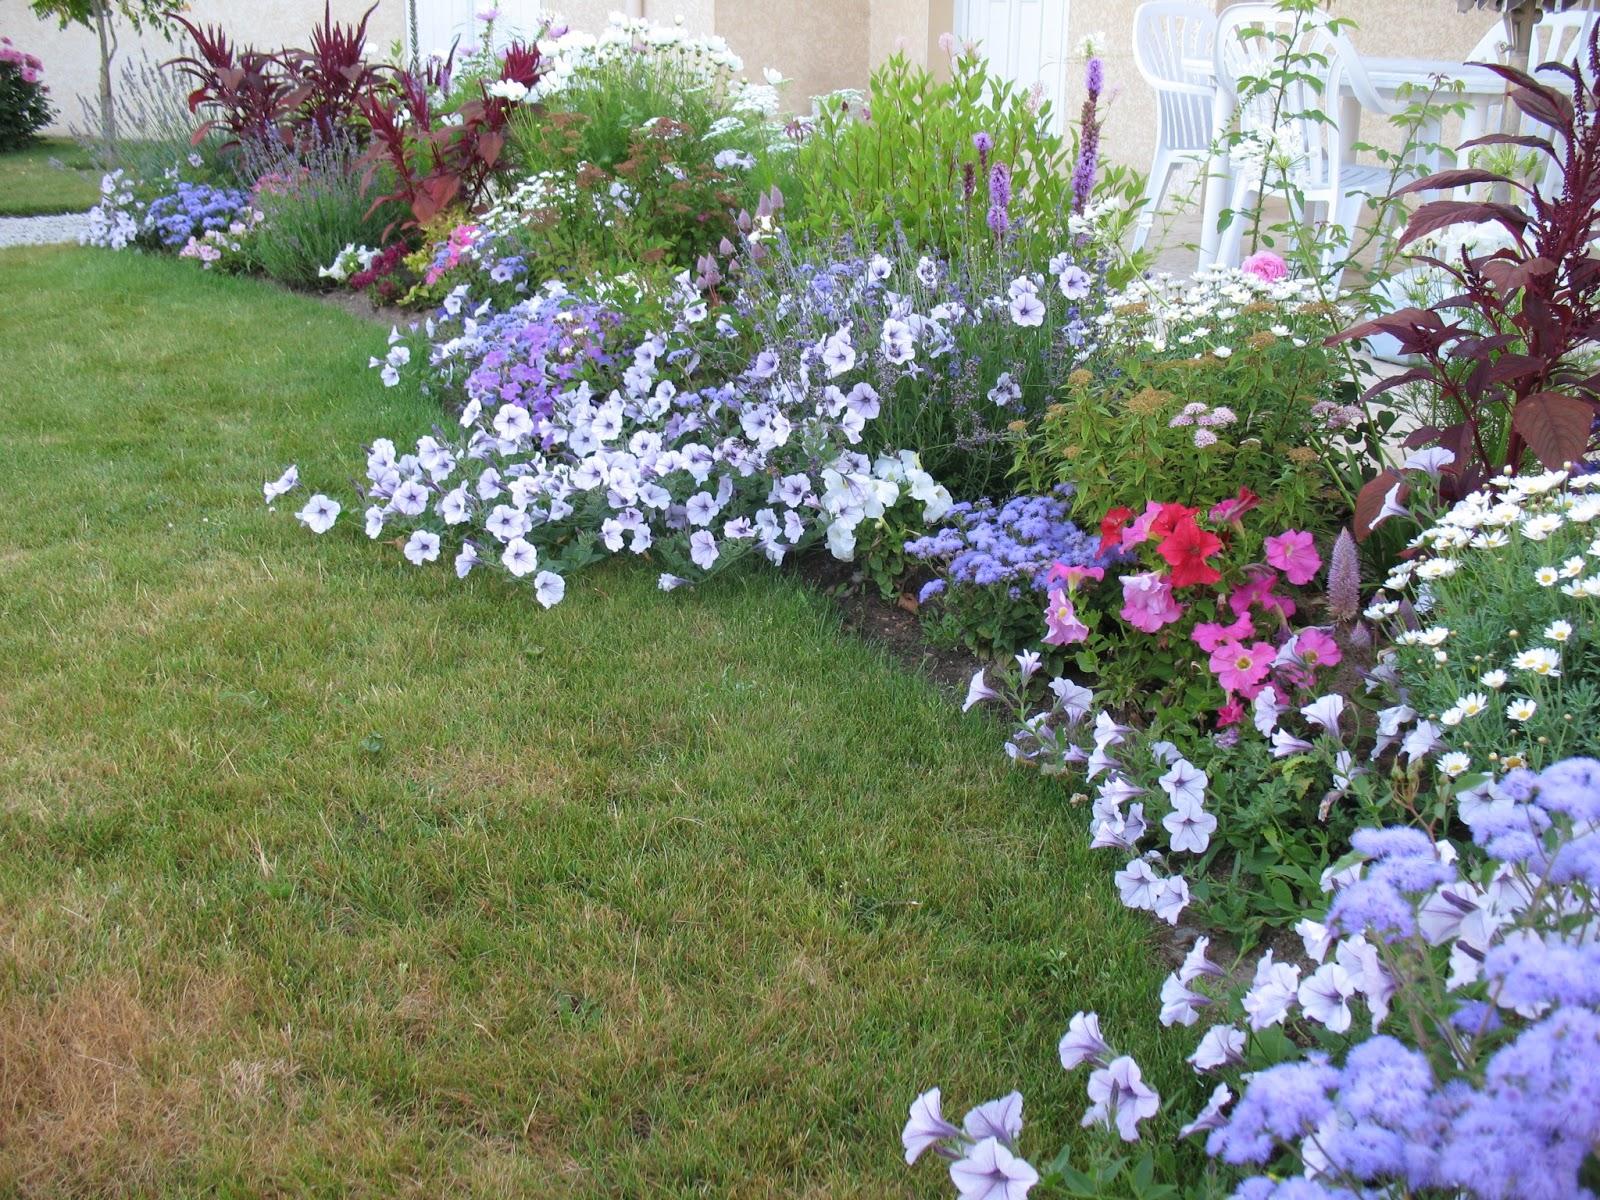 Roses du jardin ch neland surfinia p tunia - Ou planter la rhubarbe dans le jardin ...